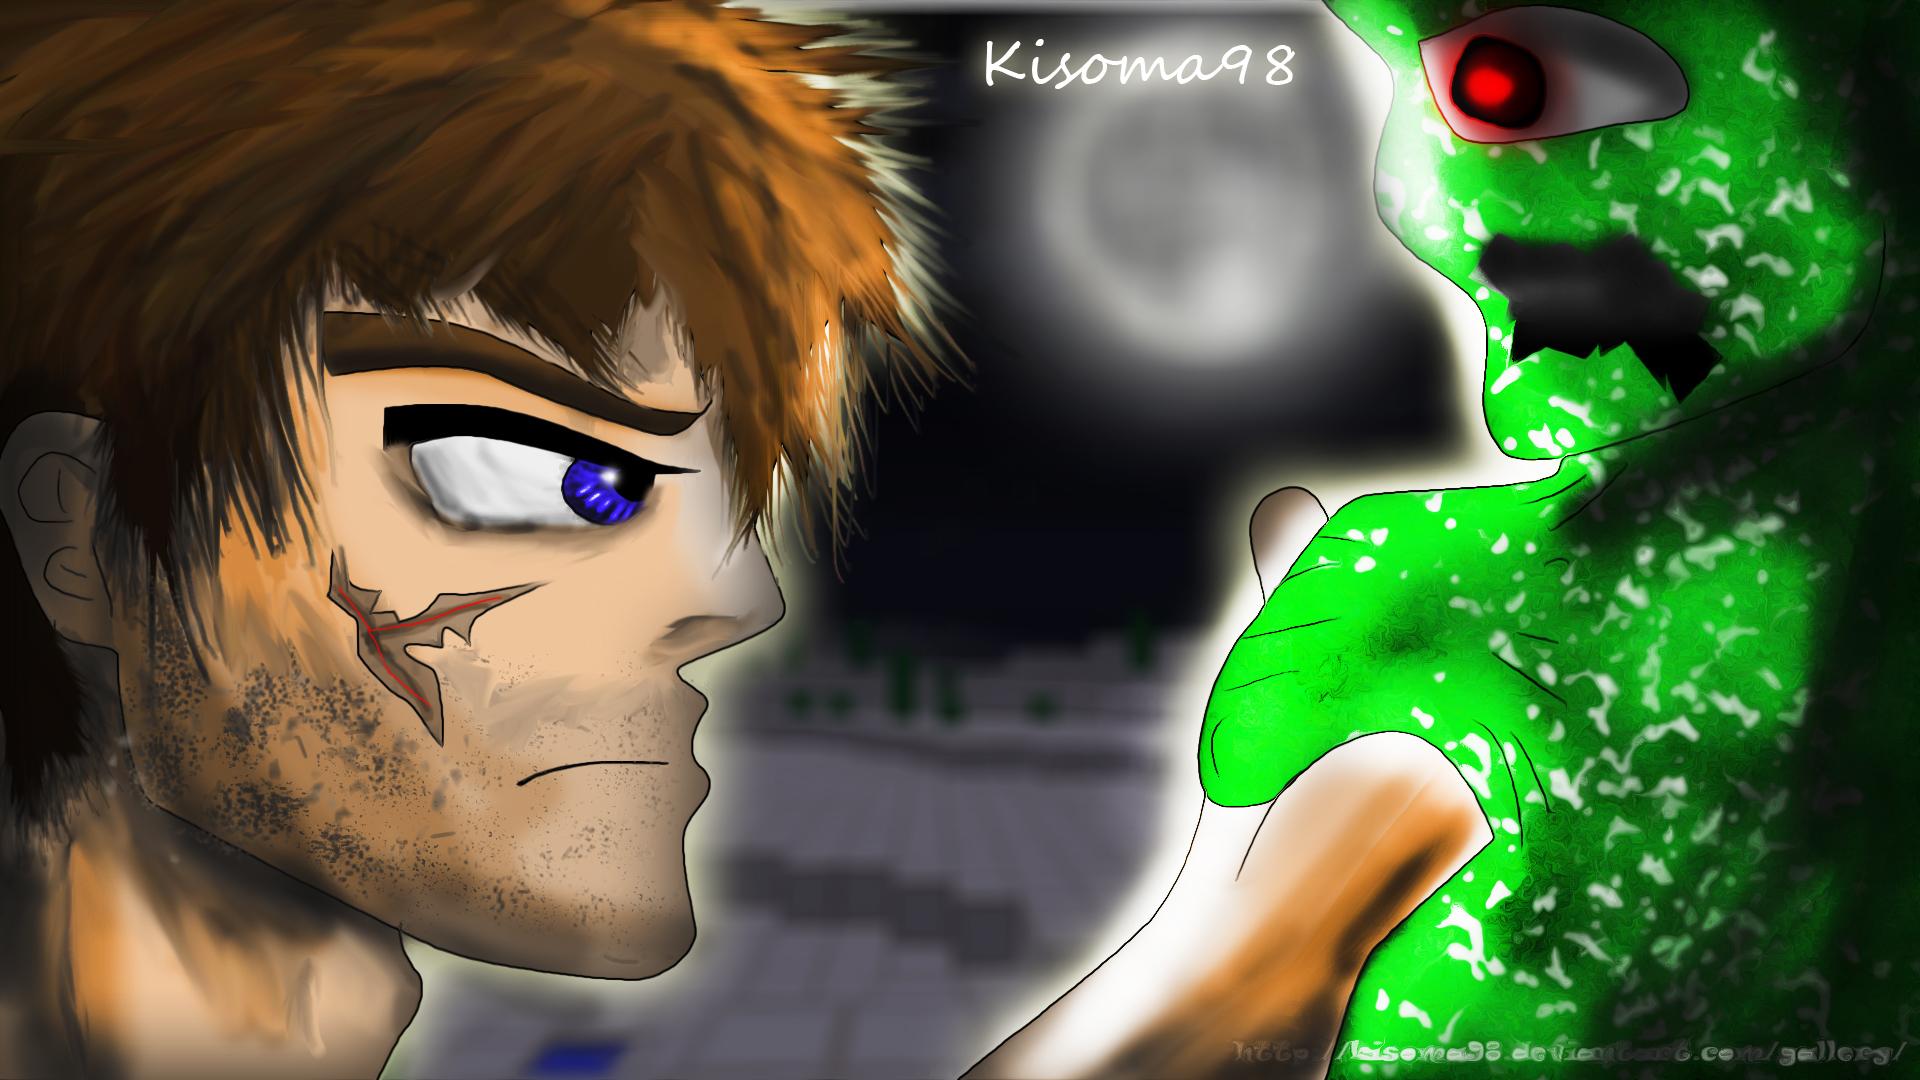 Minecraft fan art steve vs creeper quality by kisoma98 on - Minecraft creeper and steve ...